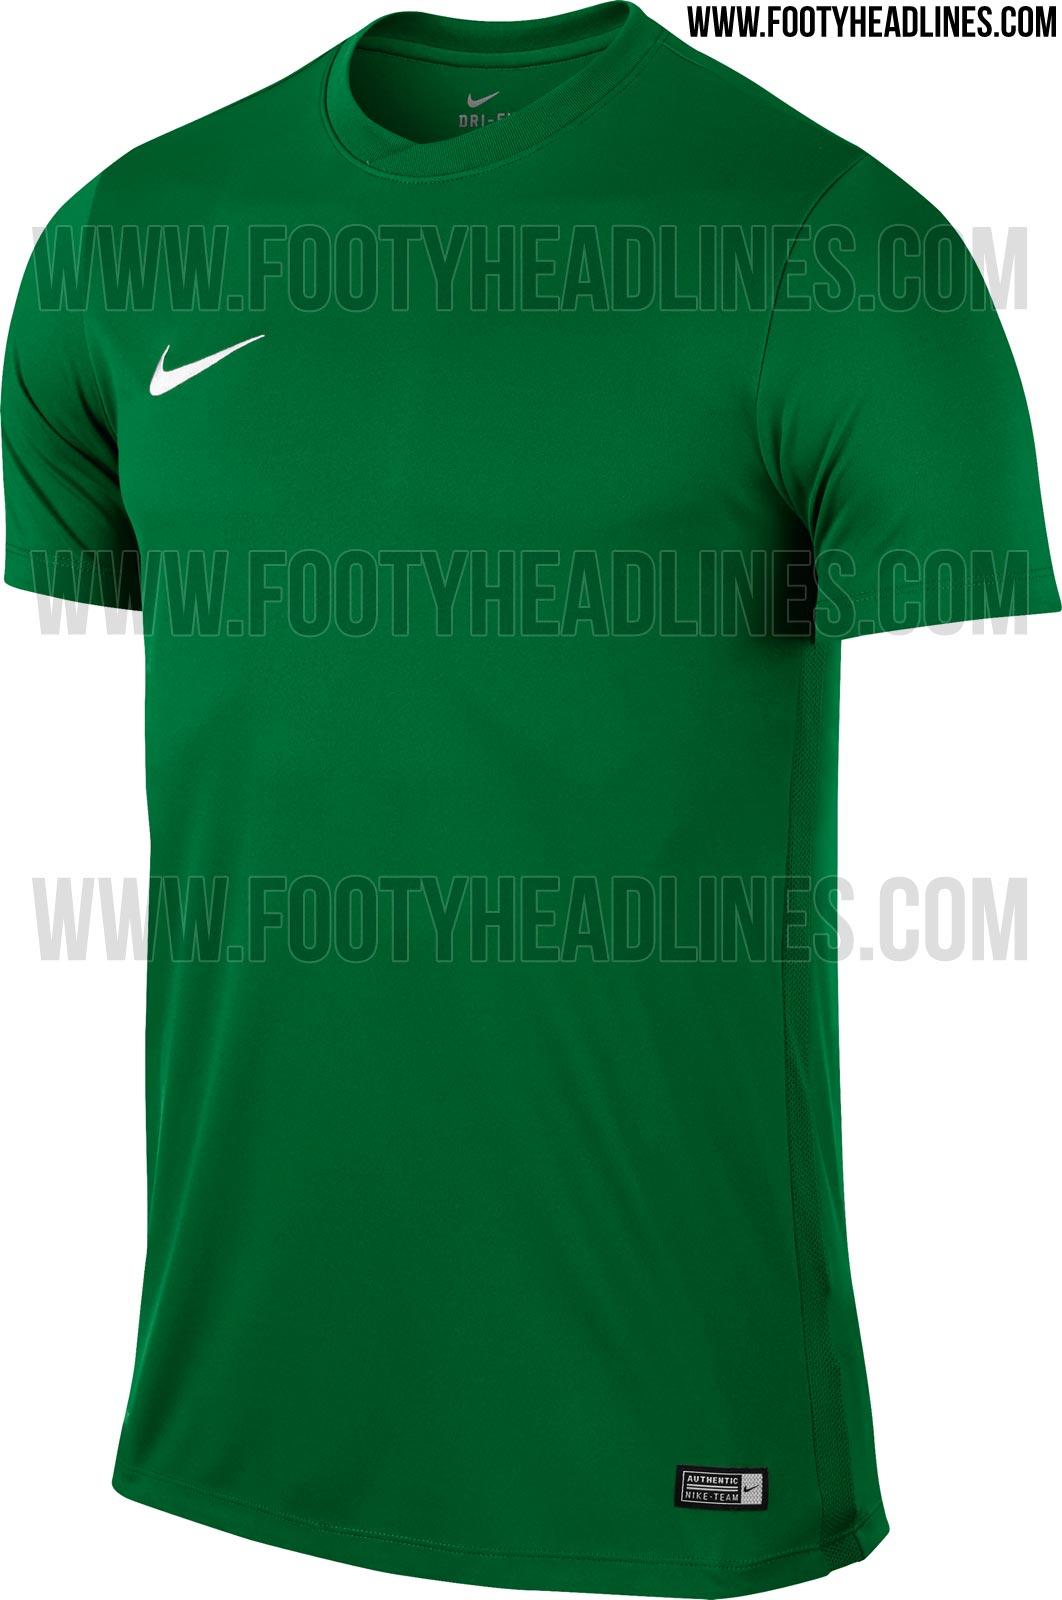 nike green jersey